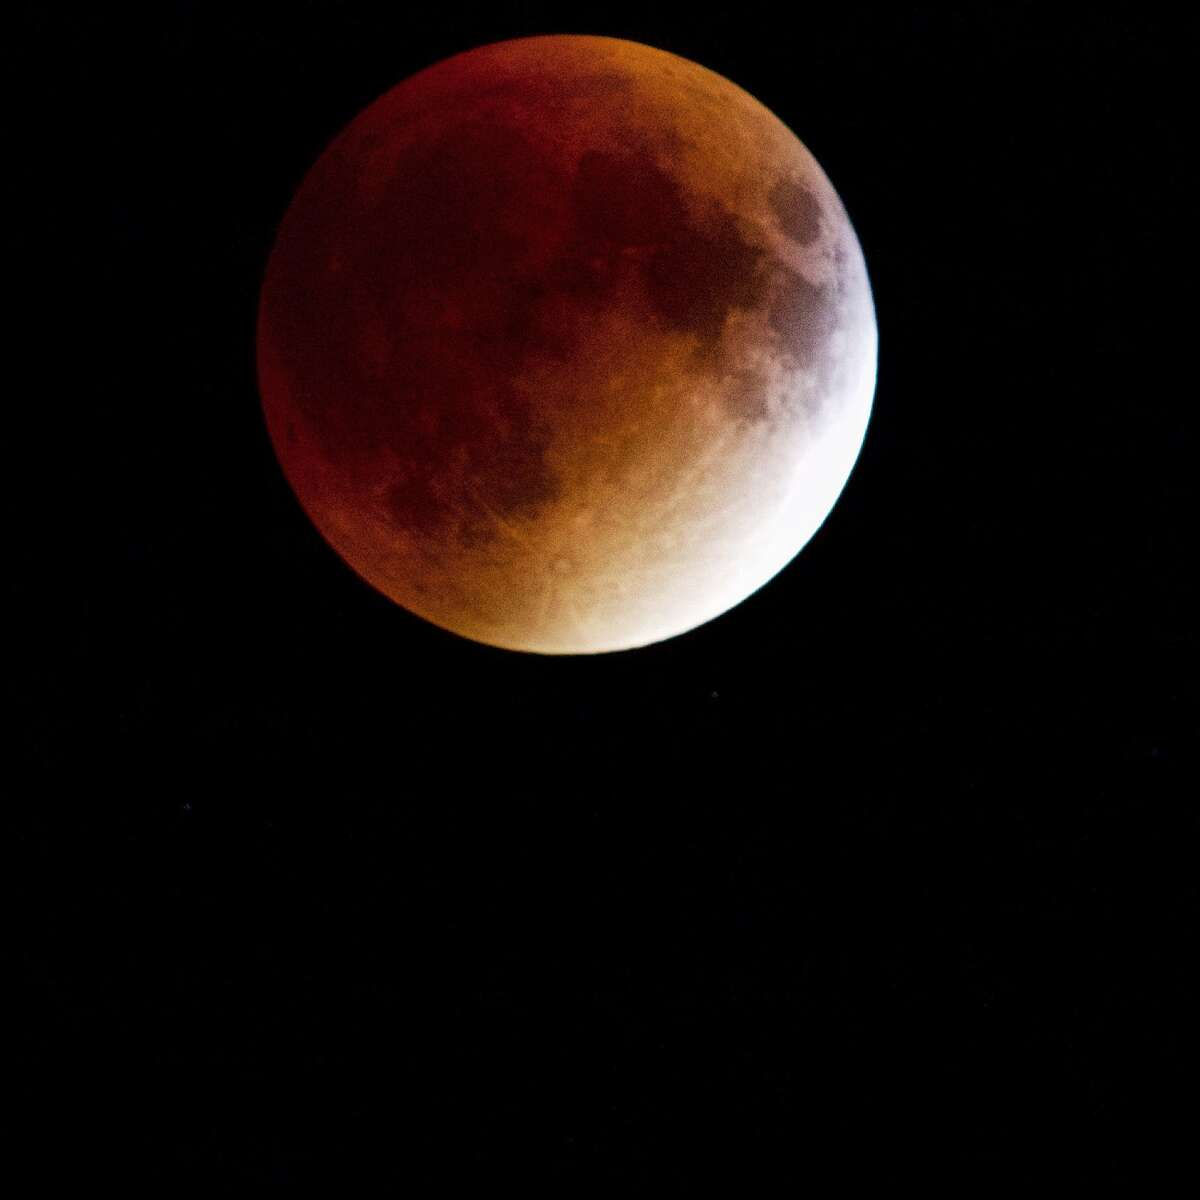 Marcin Stawiarski took this photo of the moon shining over Shelton